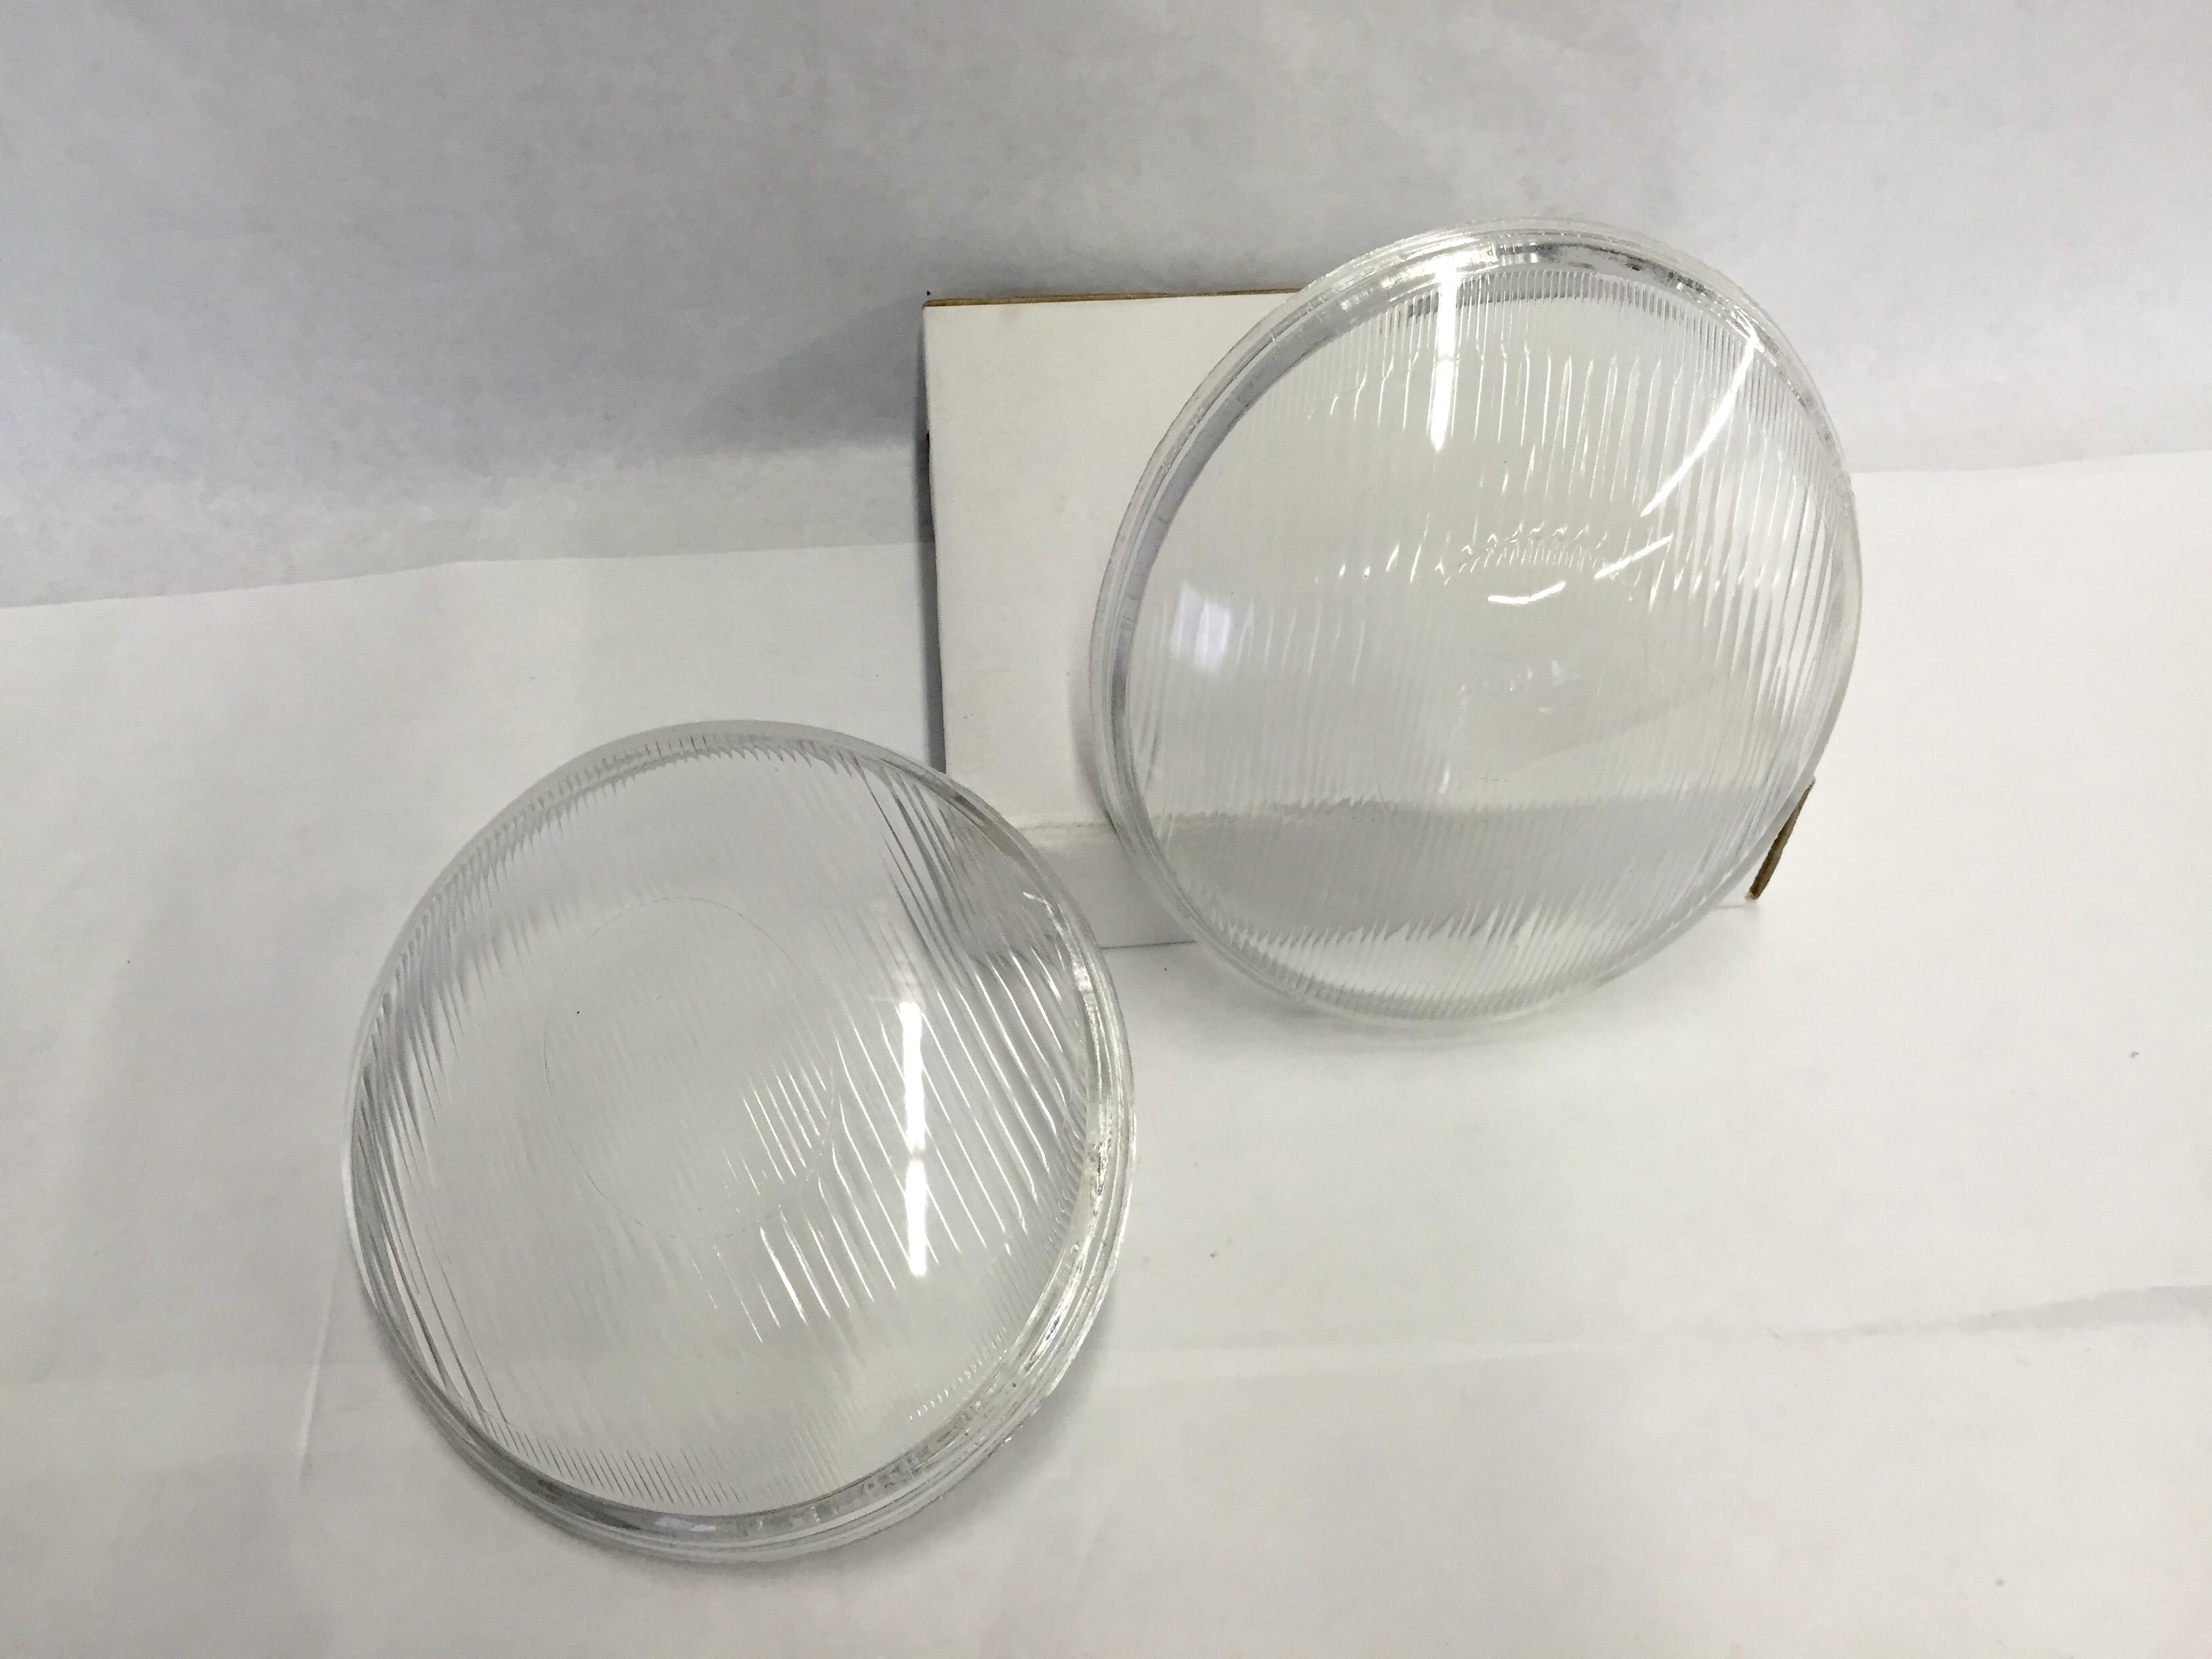 European Headlight Lens - Vintage Style